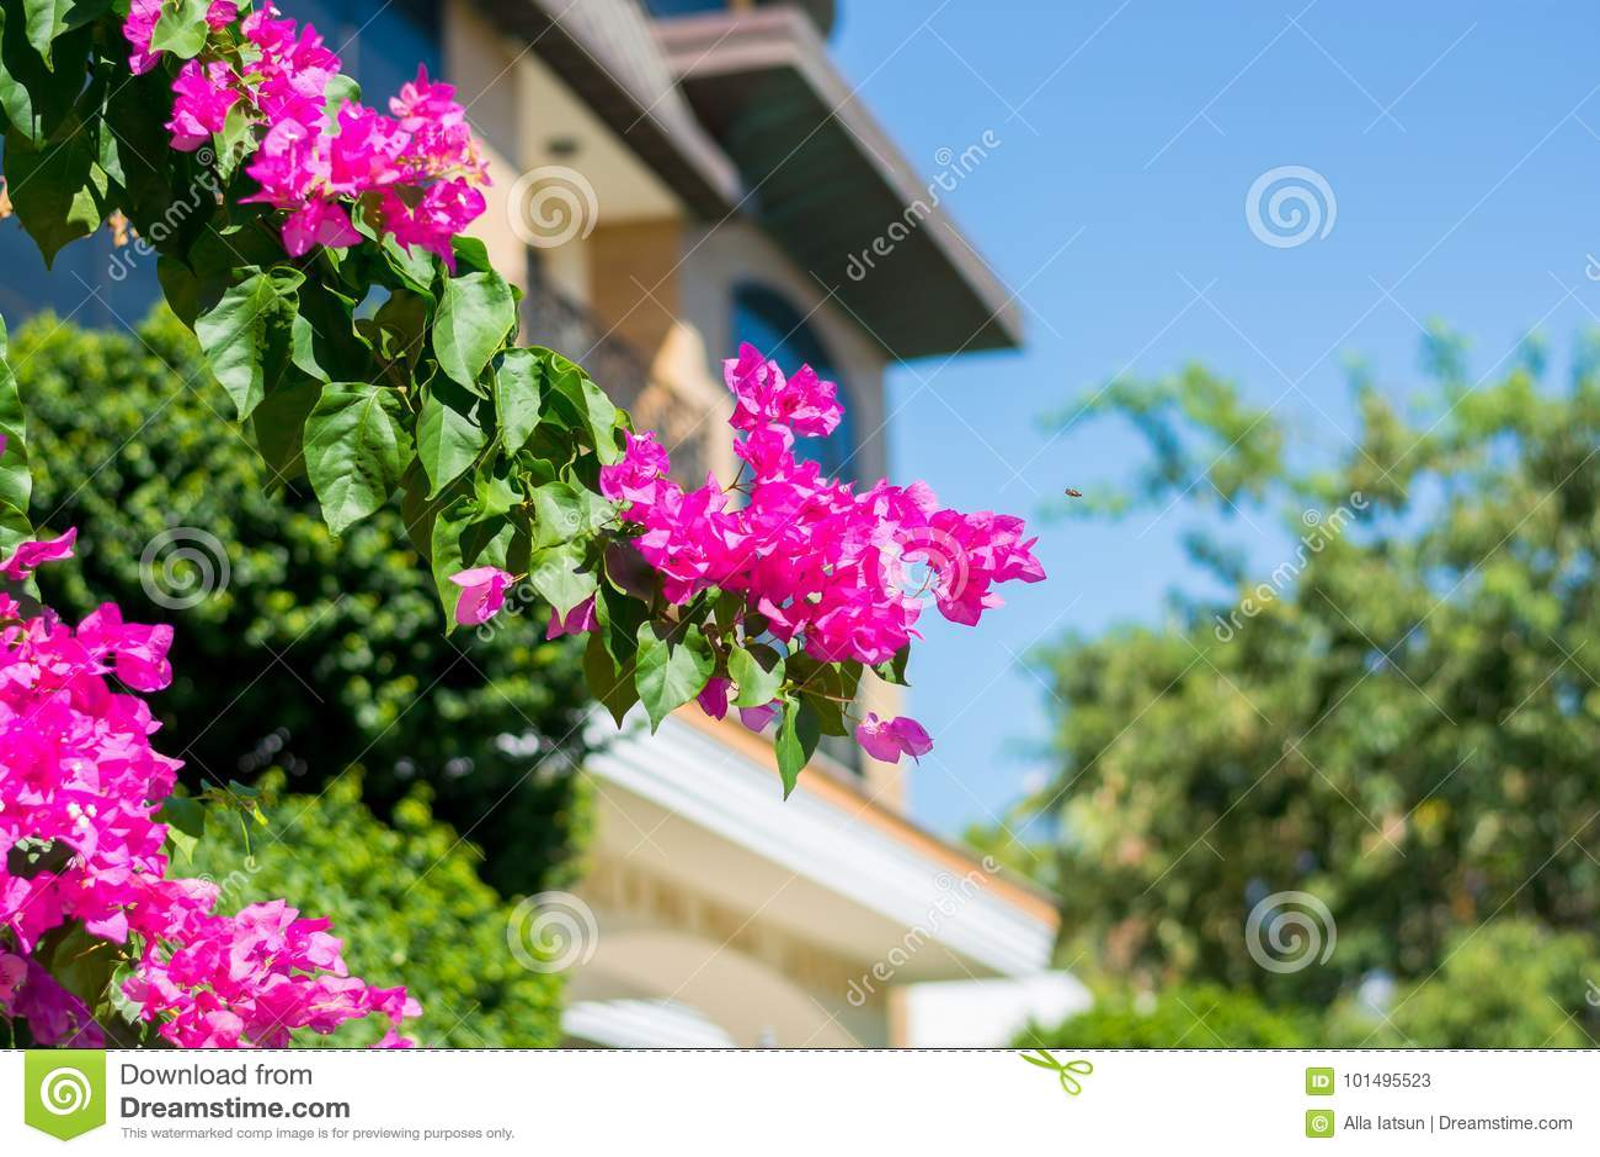 Bougainvillea decorative flower bush on the background of the bu